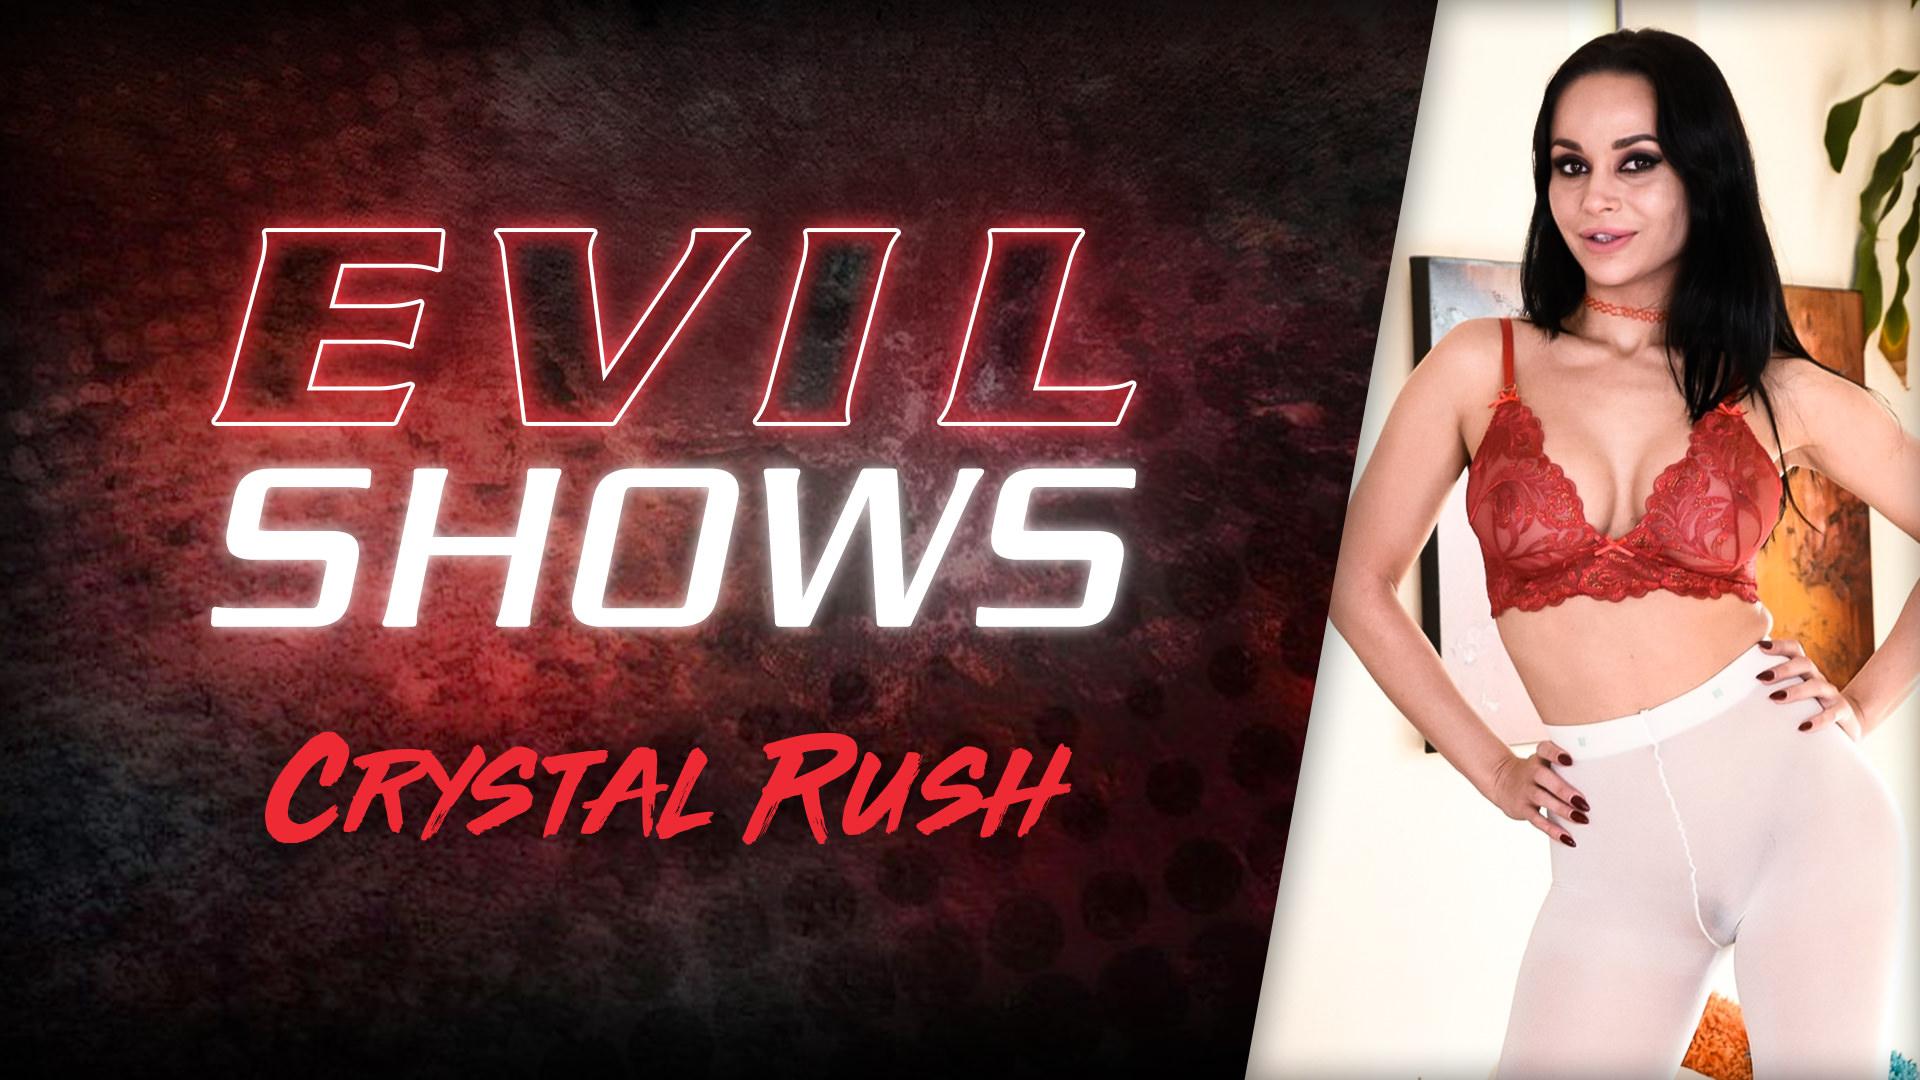 Evil Shows - Crystal Rush